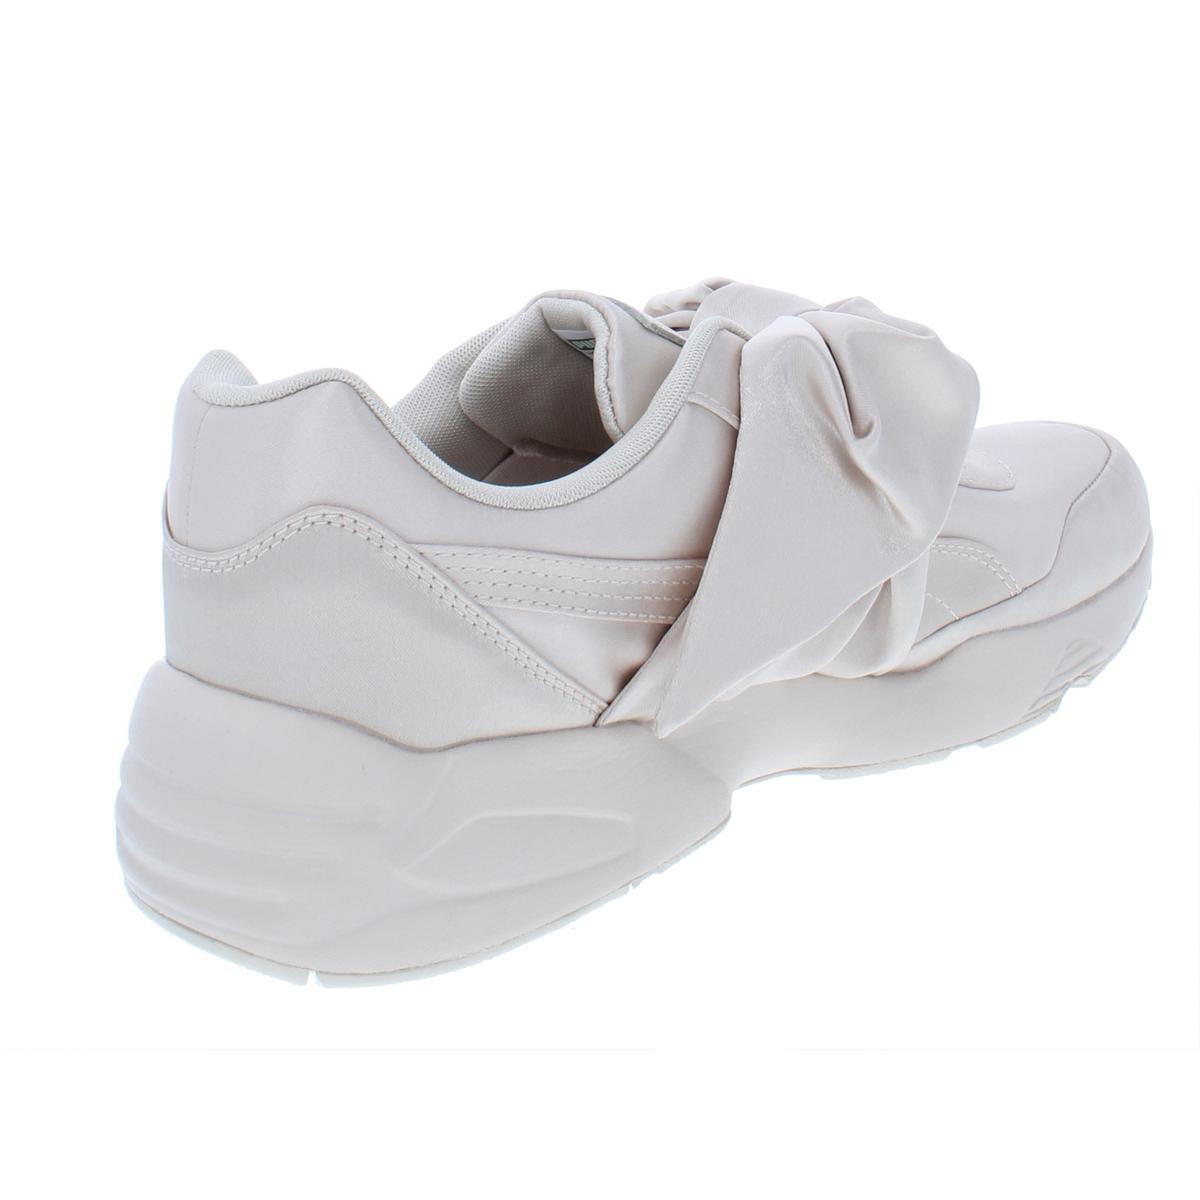 Fenty Puma by Rihanna Womens Bow Sneaker Satin Fashion Sneakers ... 56e5f2d28